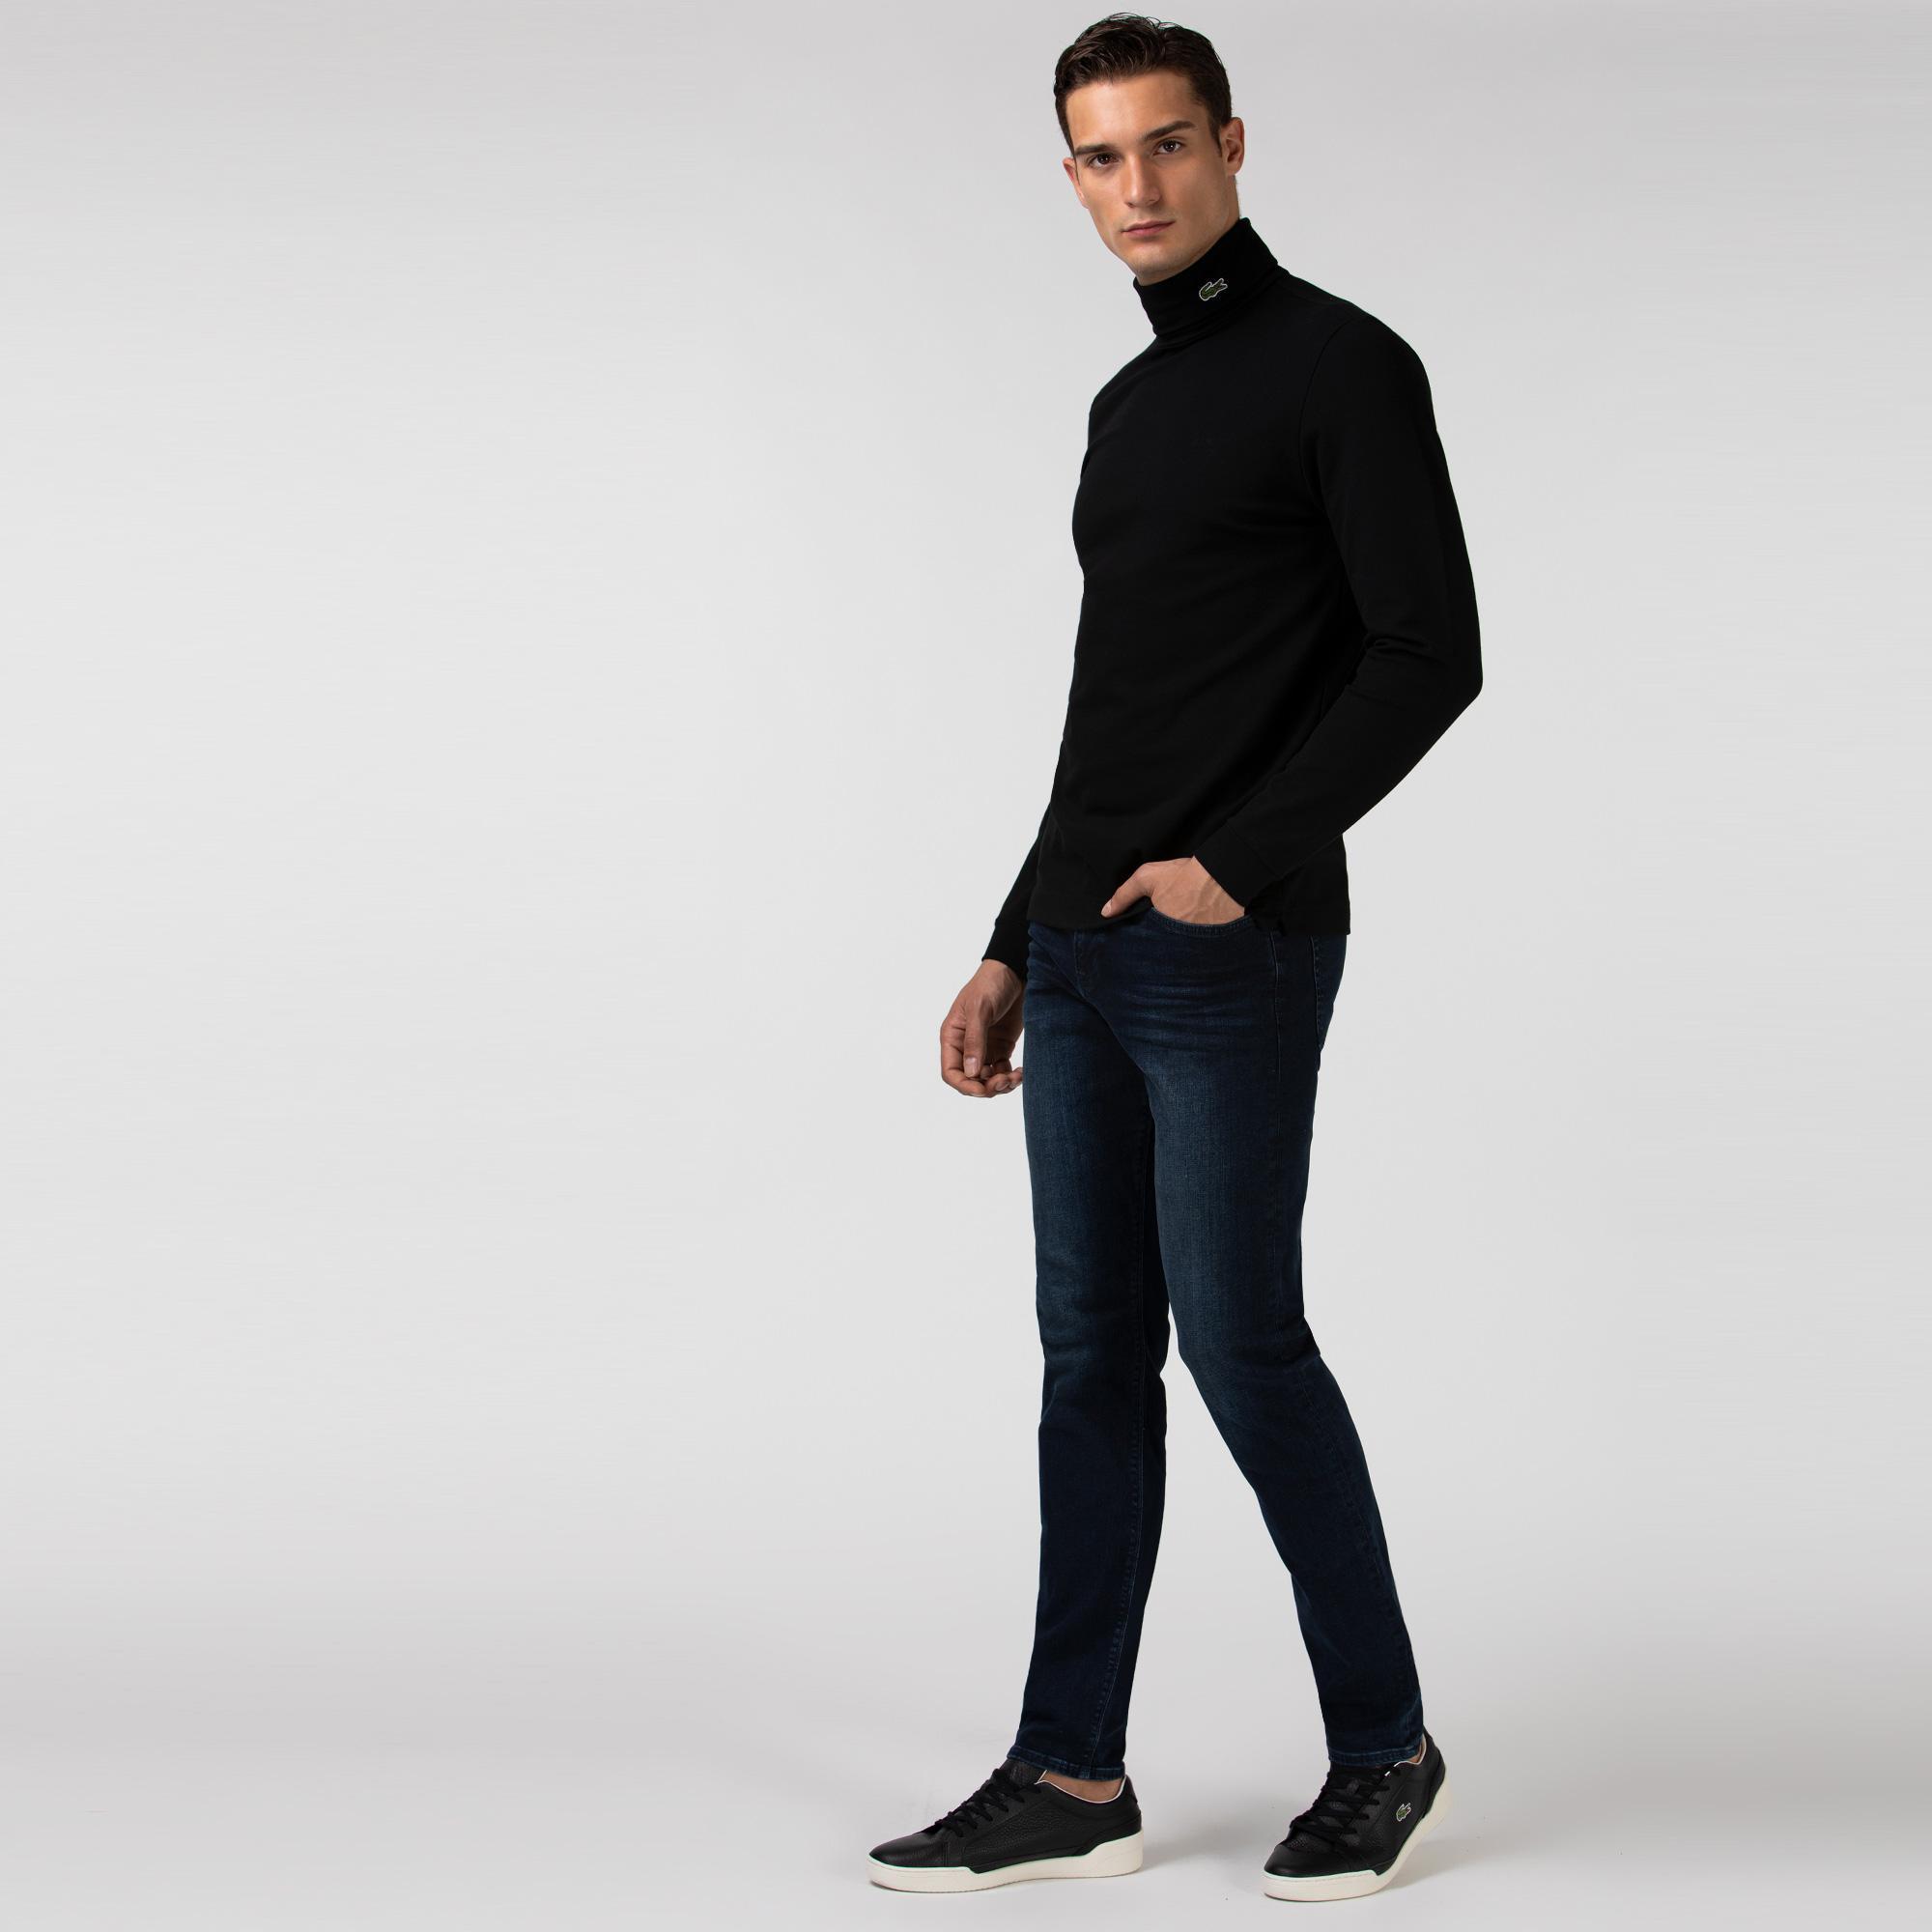 Lacoste Erkek Slim Fit Streç Denim Denim Pantolon